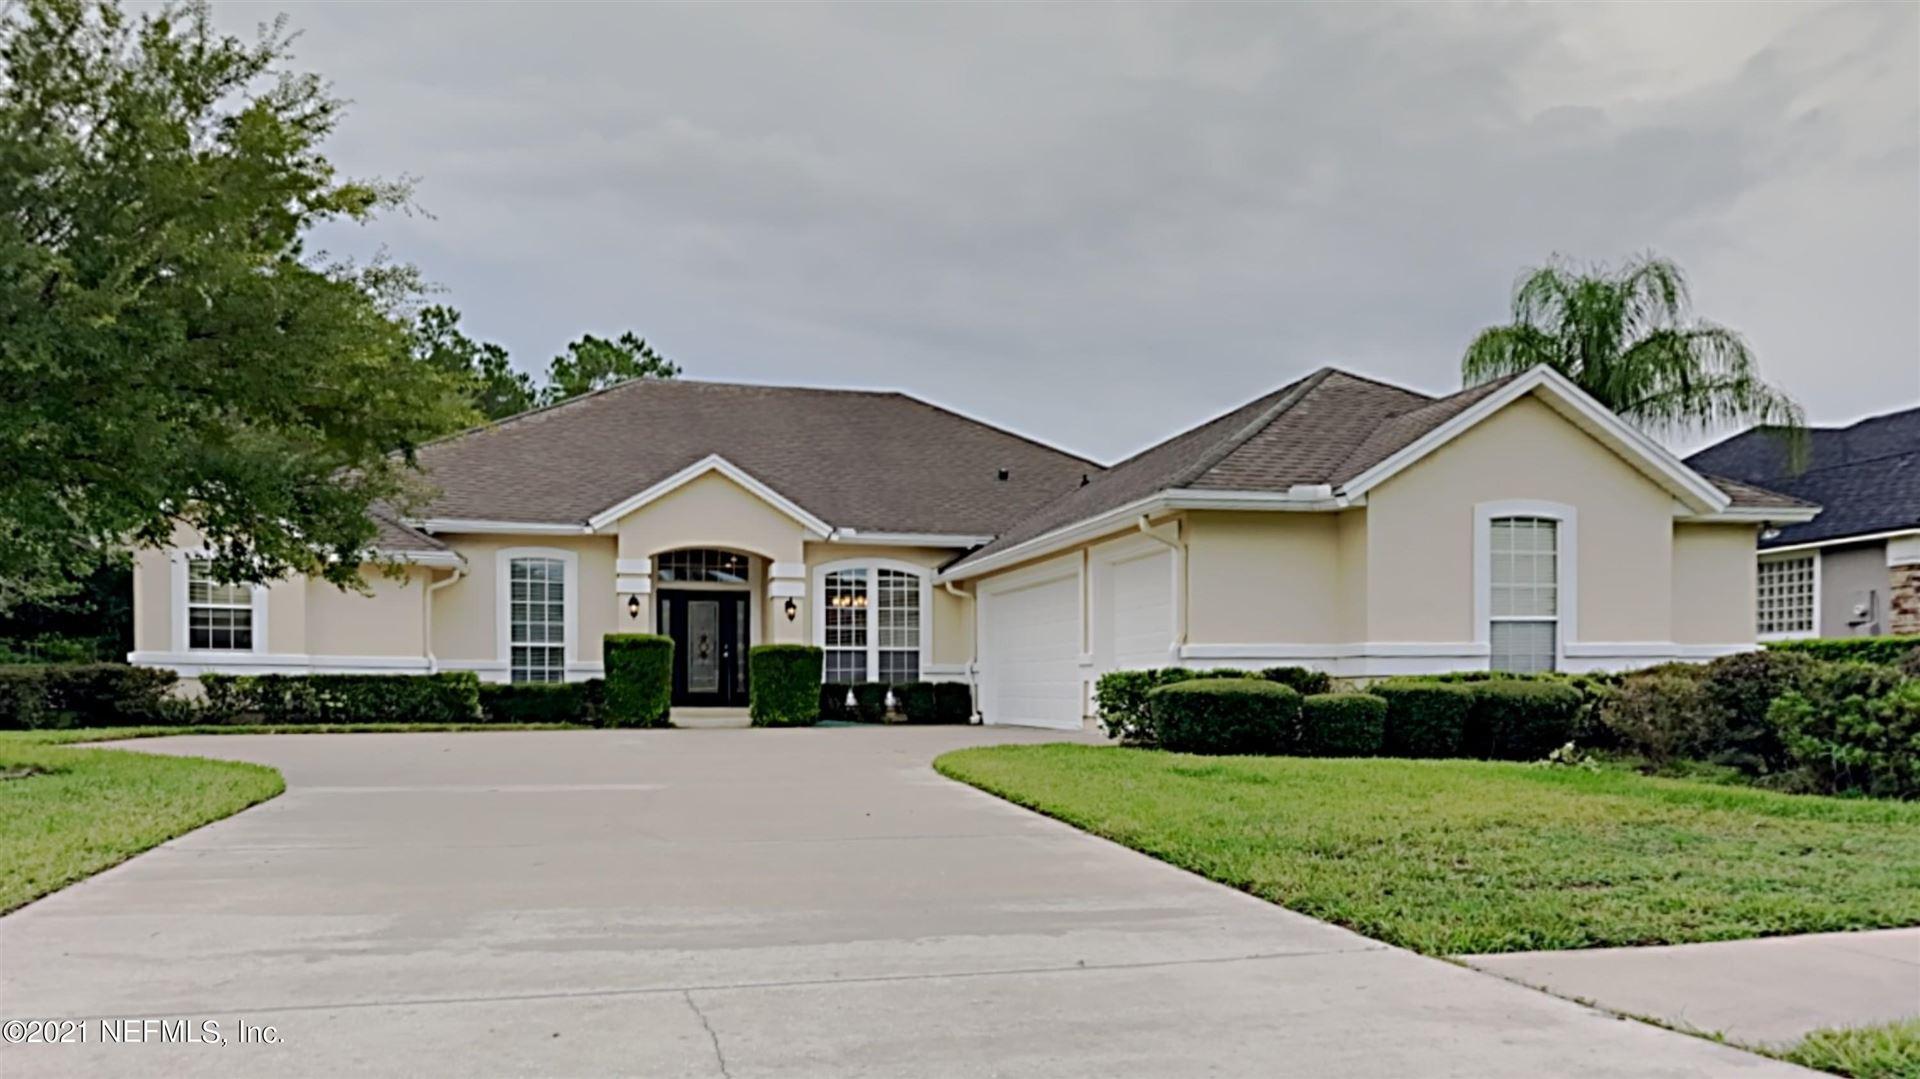 3490 BABICHE ST, Fruit Cove, FL 32259 - MLS#: 1126999